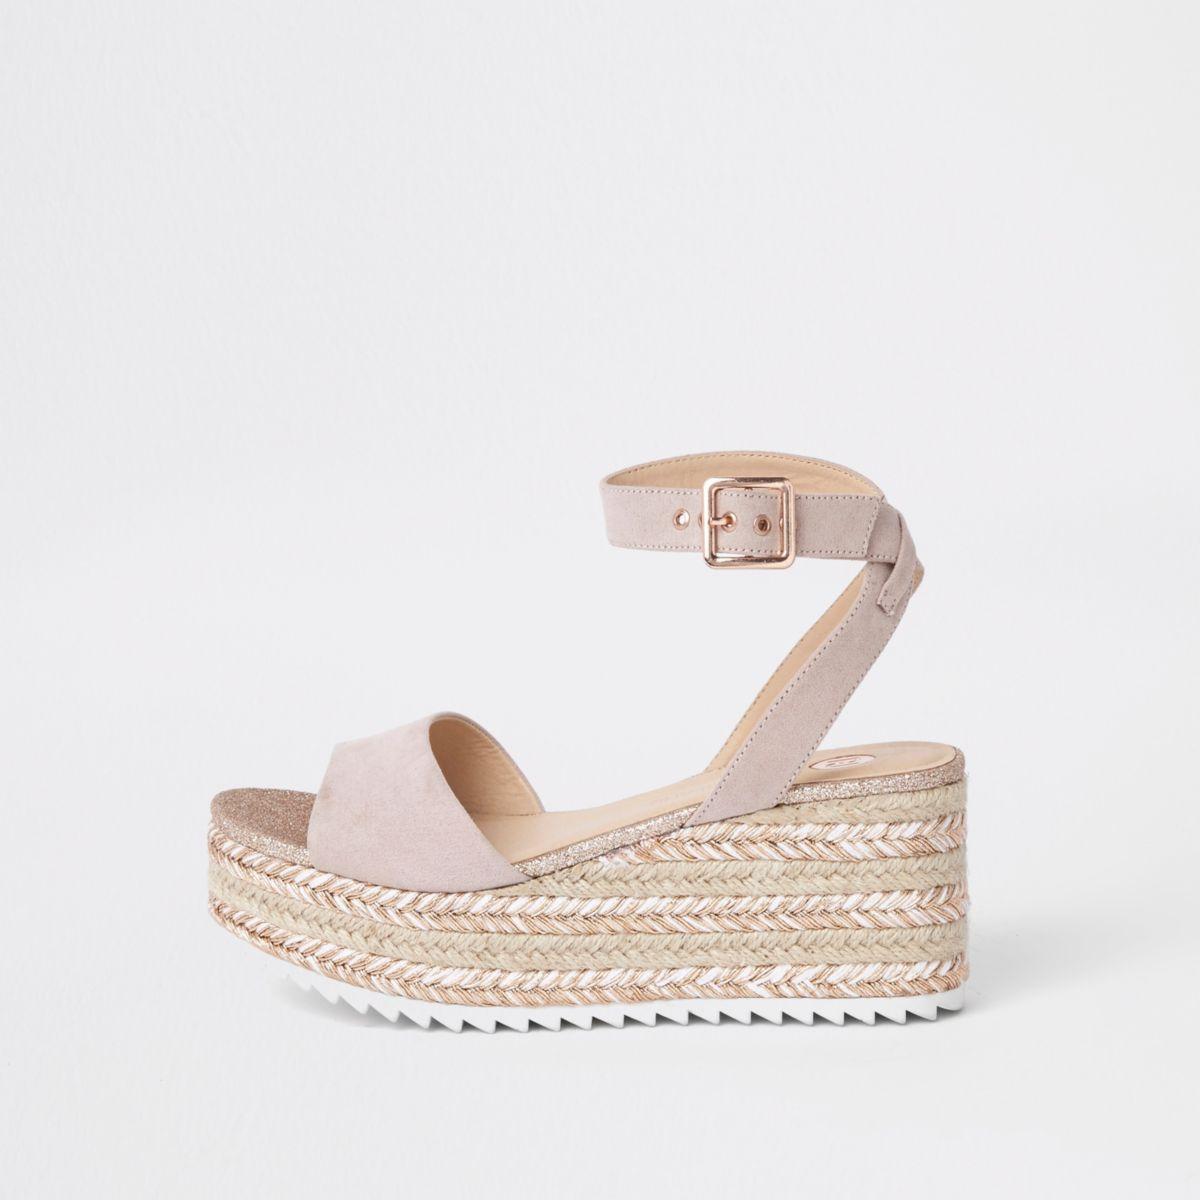 gold-glitter-espadrille-platform-sandals by river-island